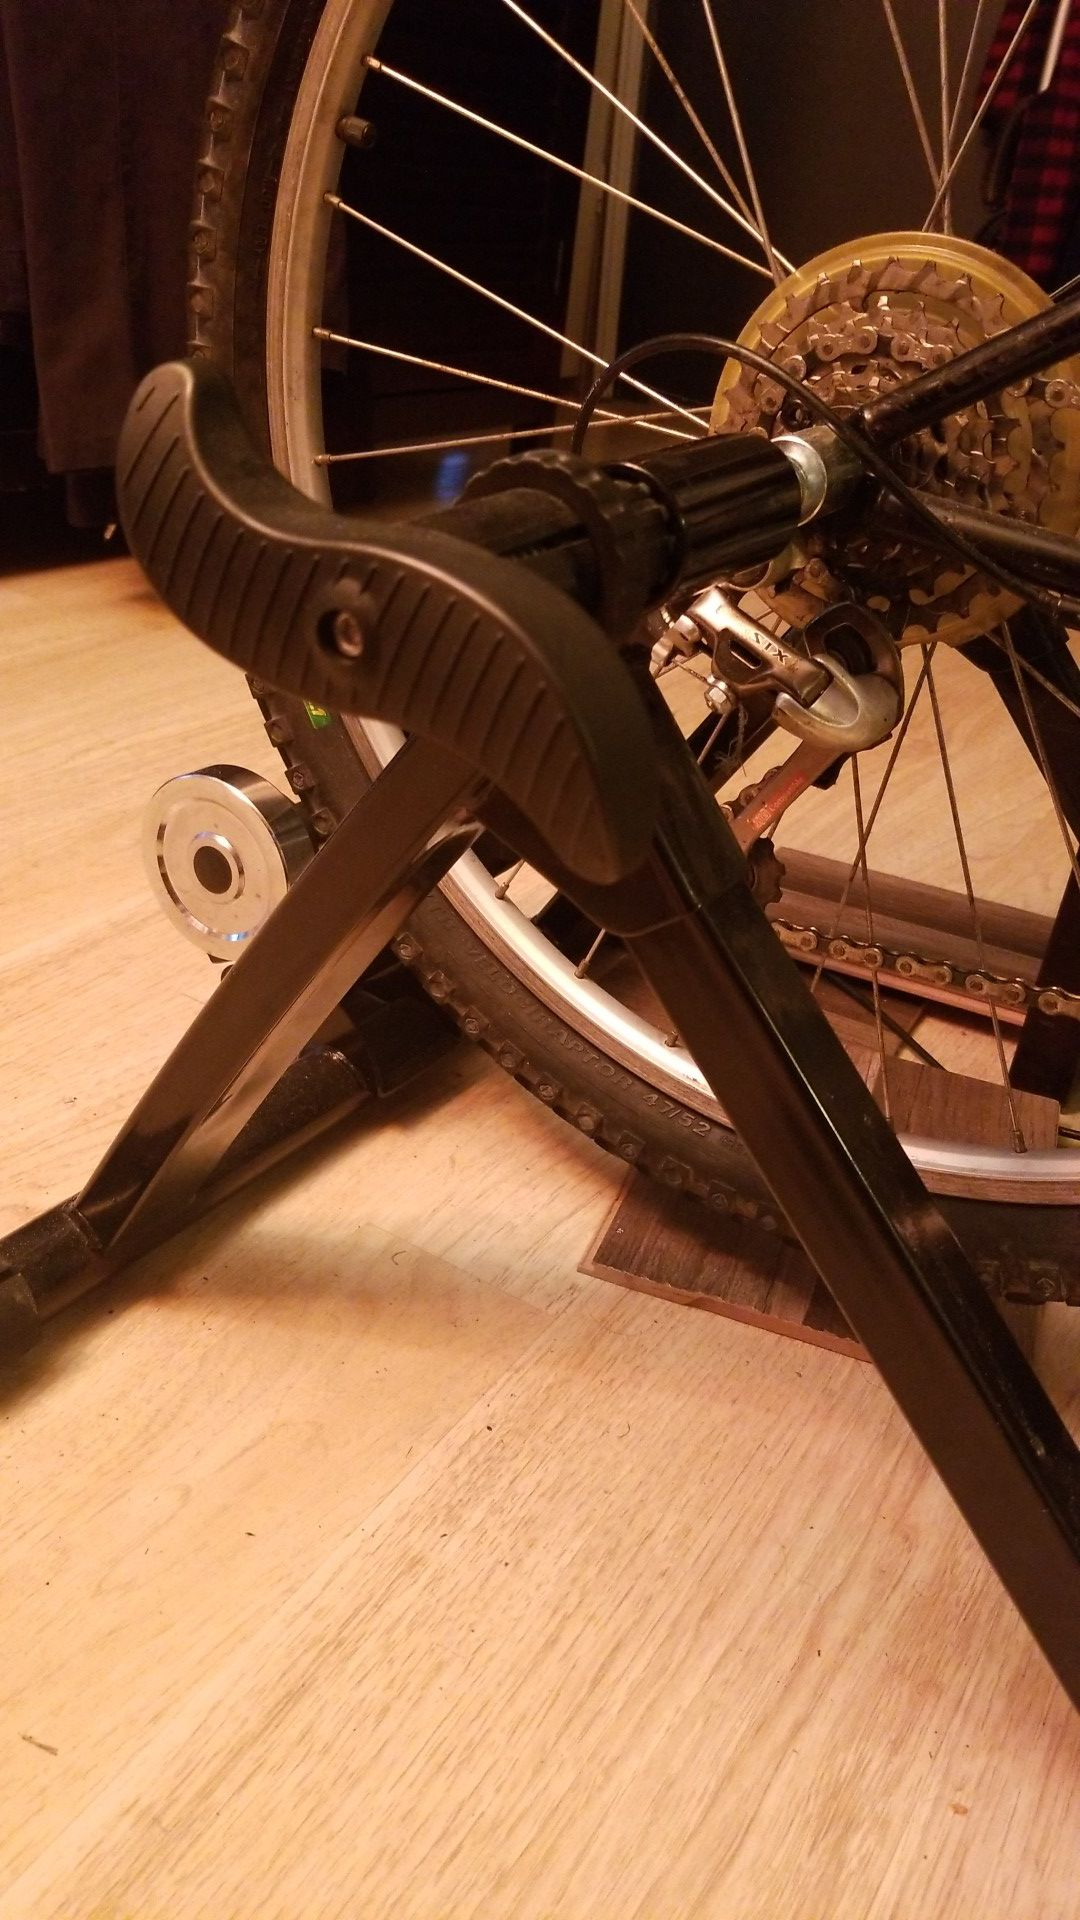 Sunlite Bicycle Resistance Trainer